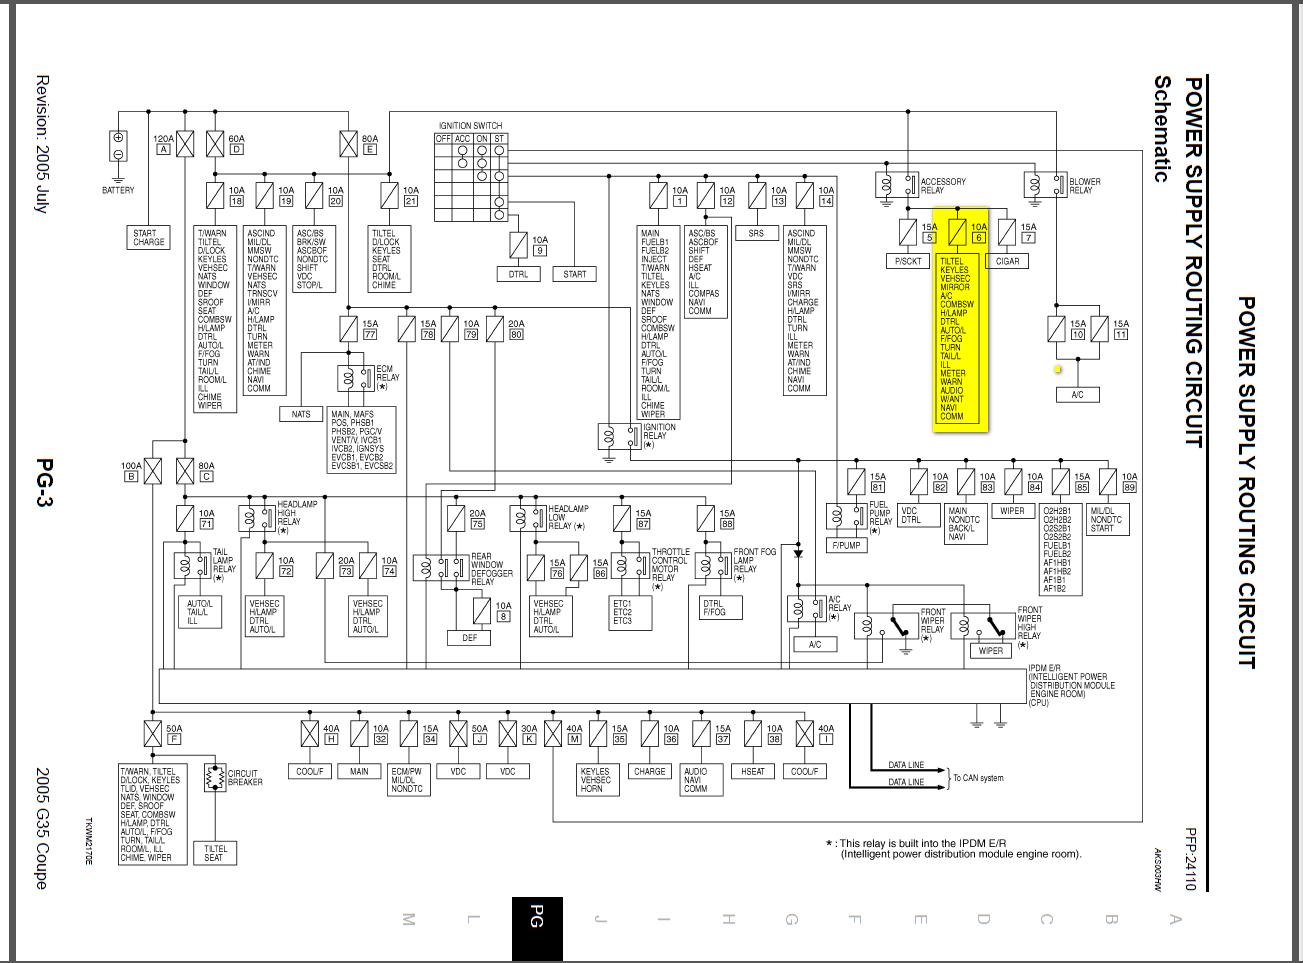 WG_5139] 2005 G35 Coupe Fuse Box Diagram Schematic WiringPuti Ixtu Nowa Orsal Emba Mohammedshrine Librar Wiring 101